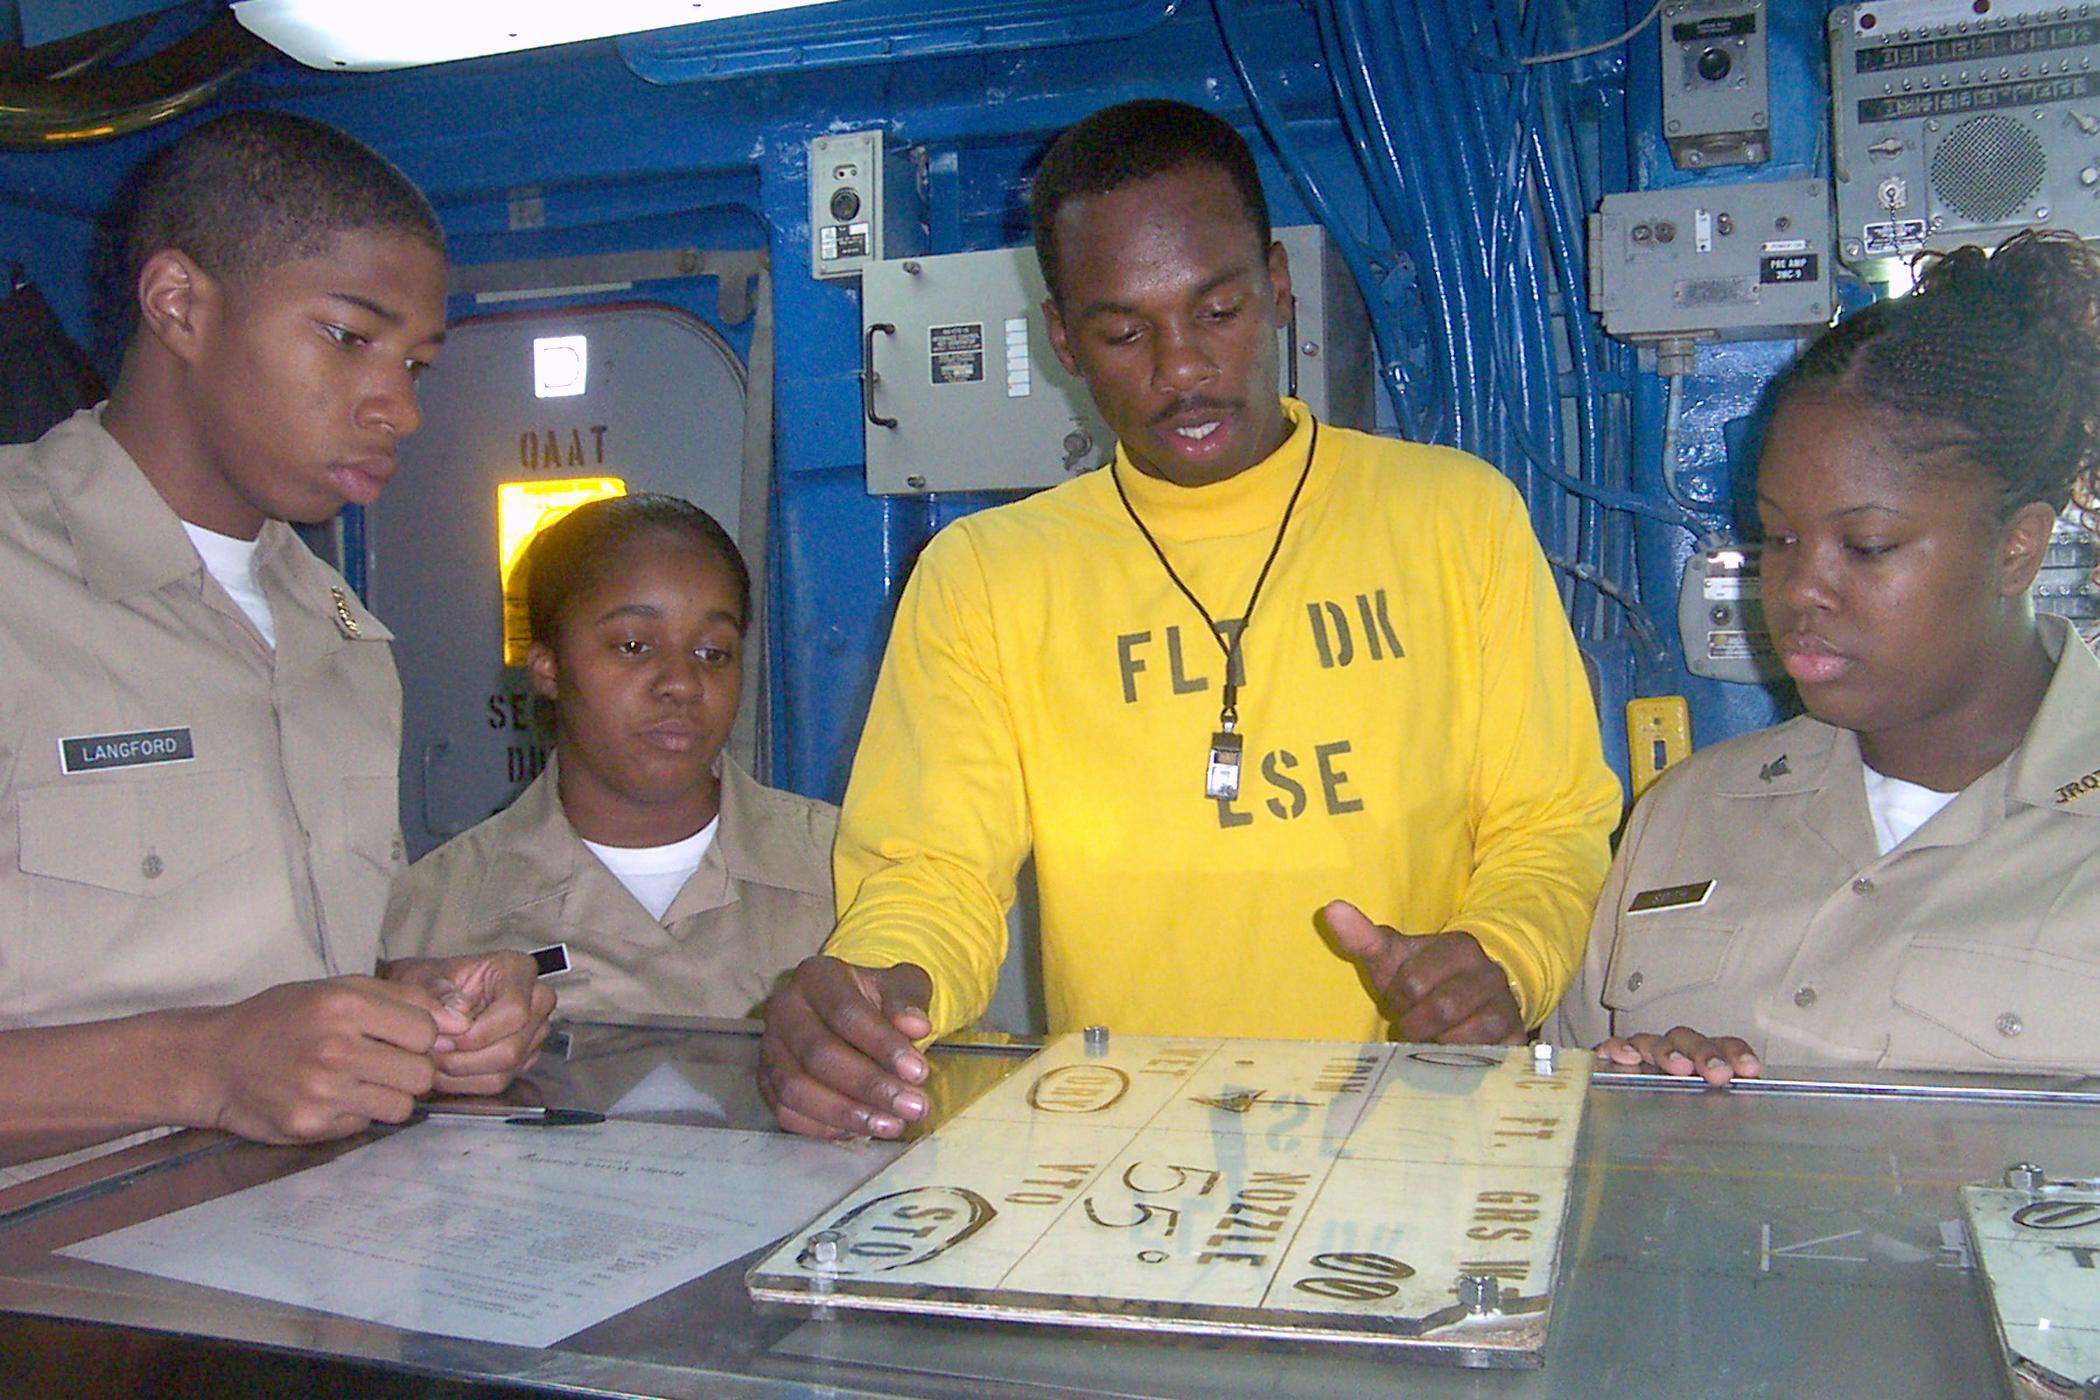 File:US Navy 021024-N-5422R-001 Airman demonstrates to Naval Junior